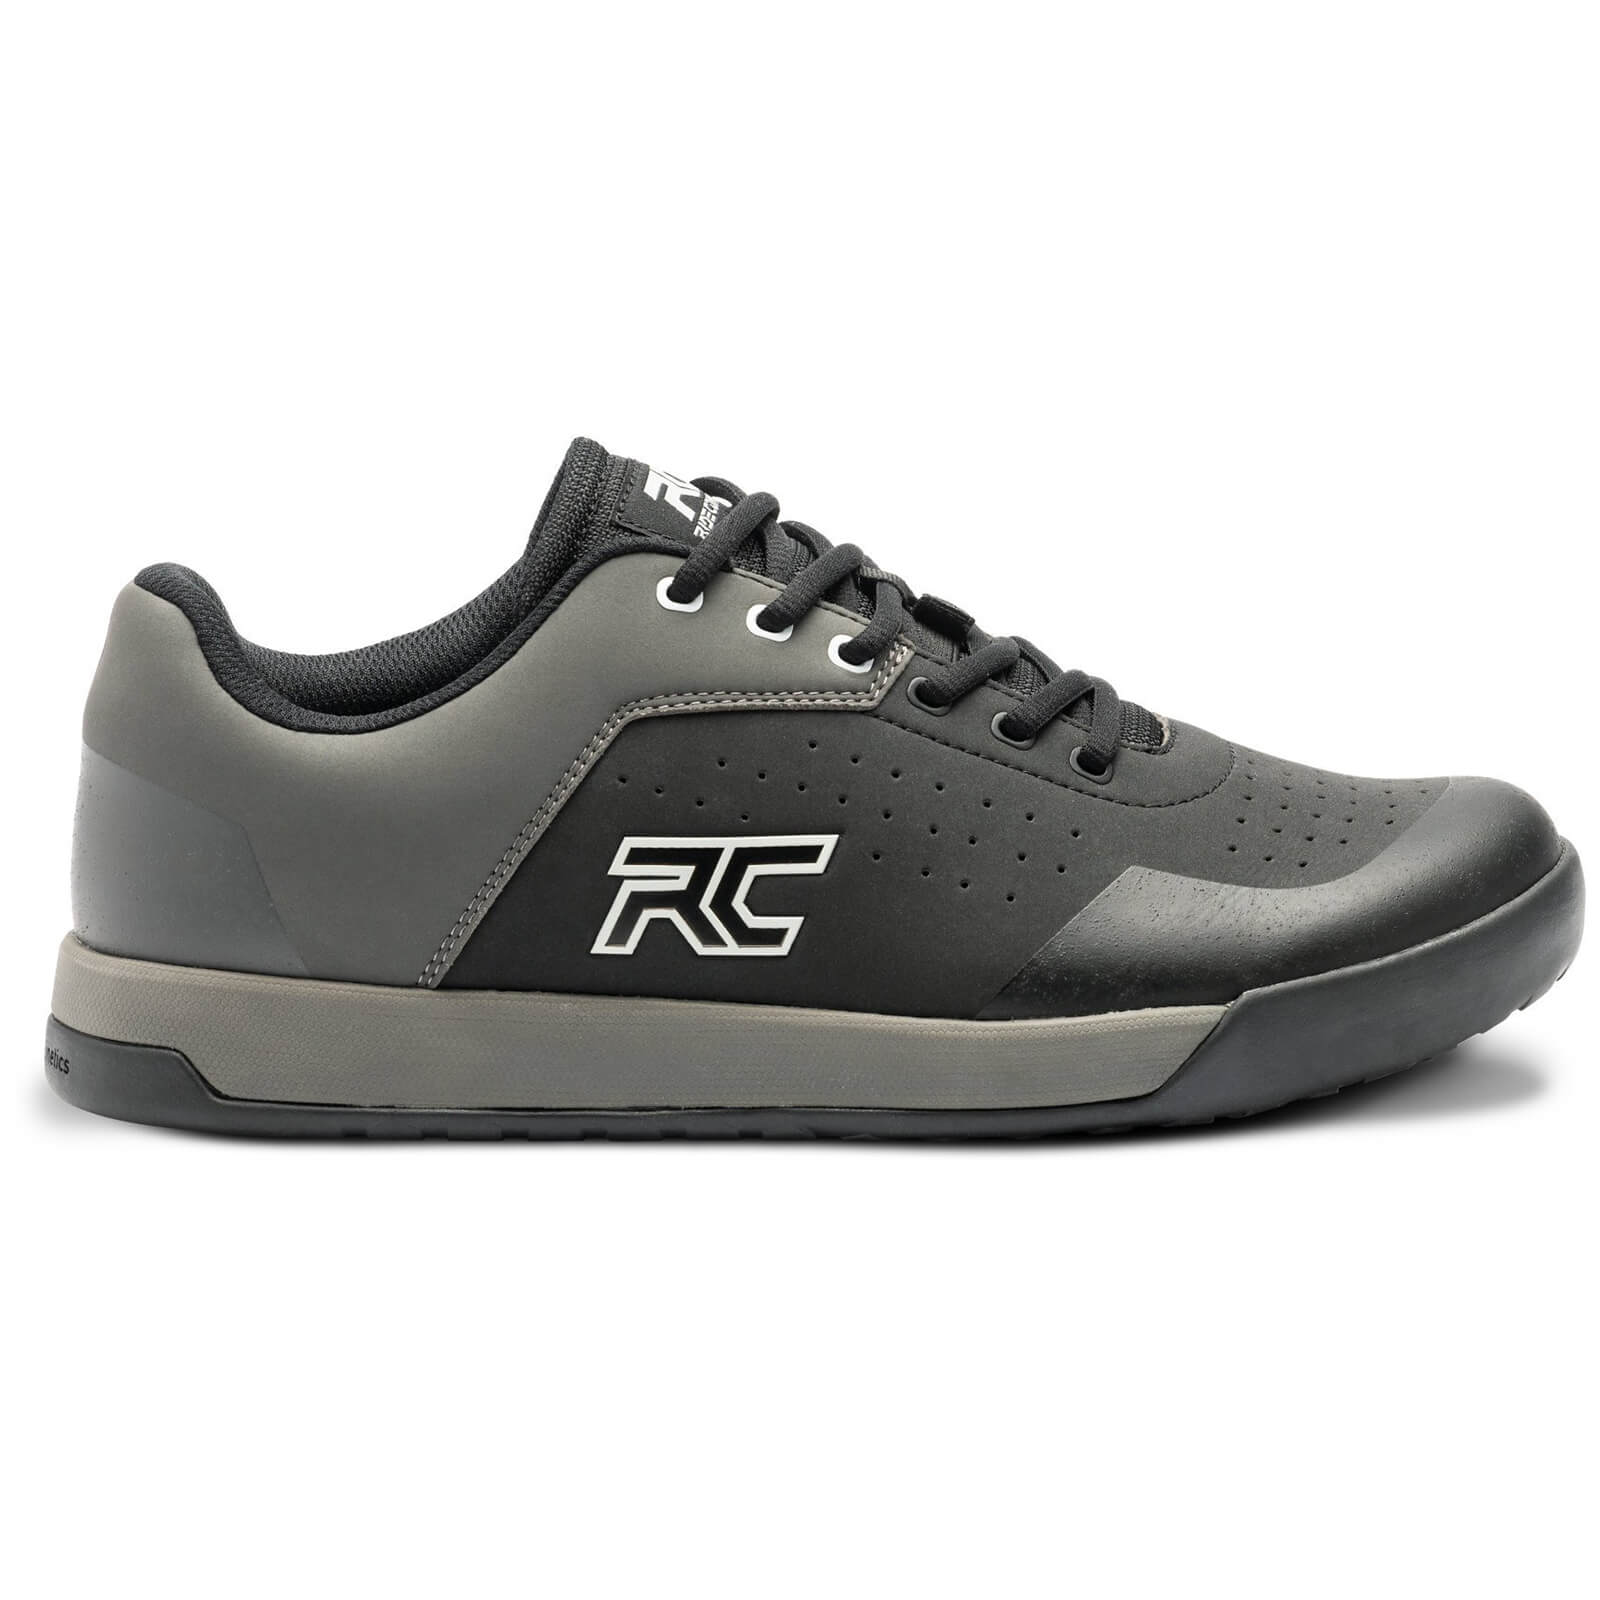 Ride Concepts Hellion Elite Flat MTB Shoes - UK 7.5/EU 41.5 - Black/Charcoal